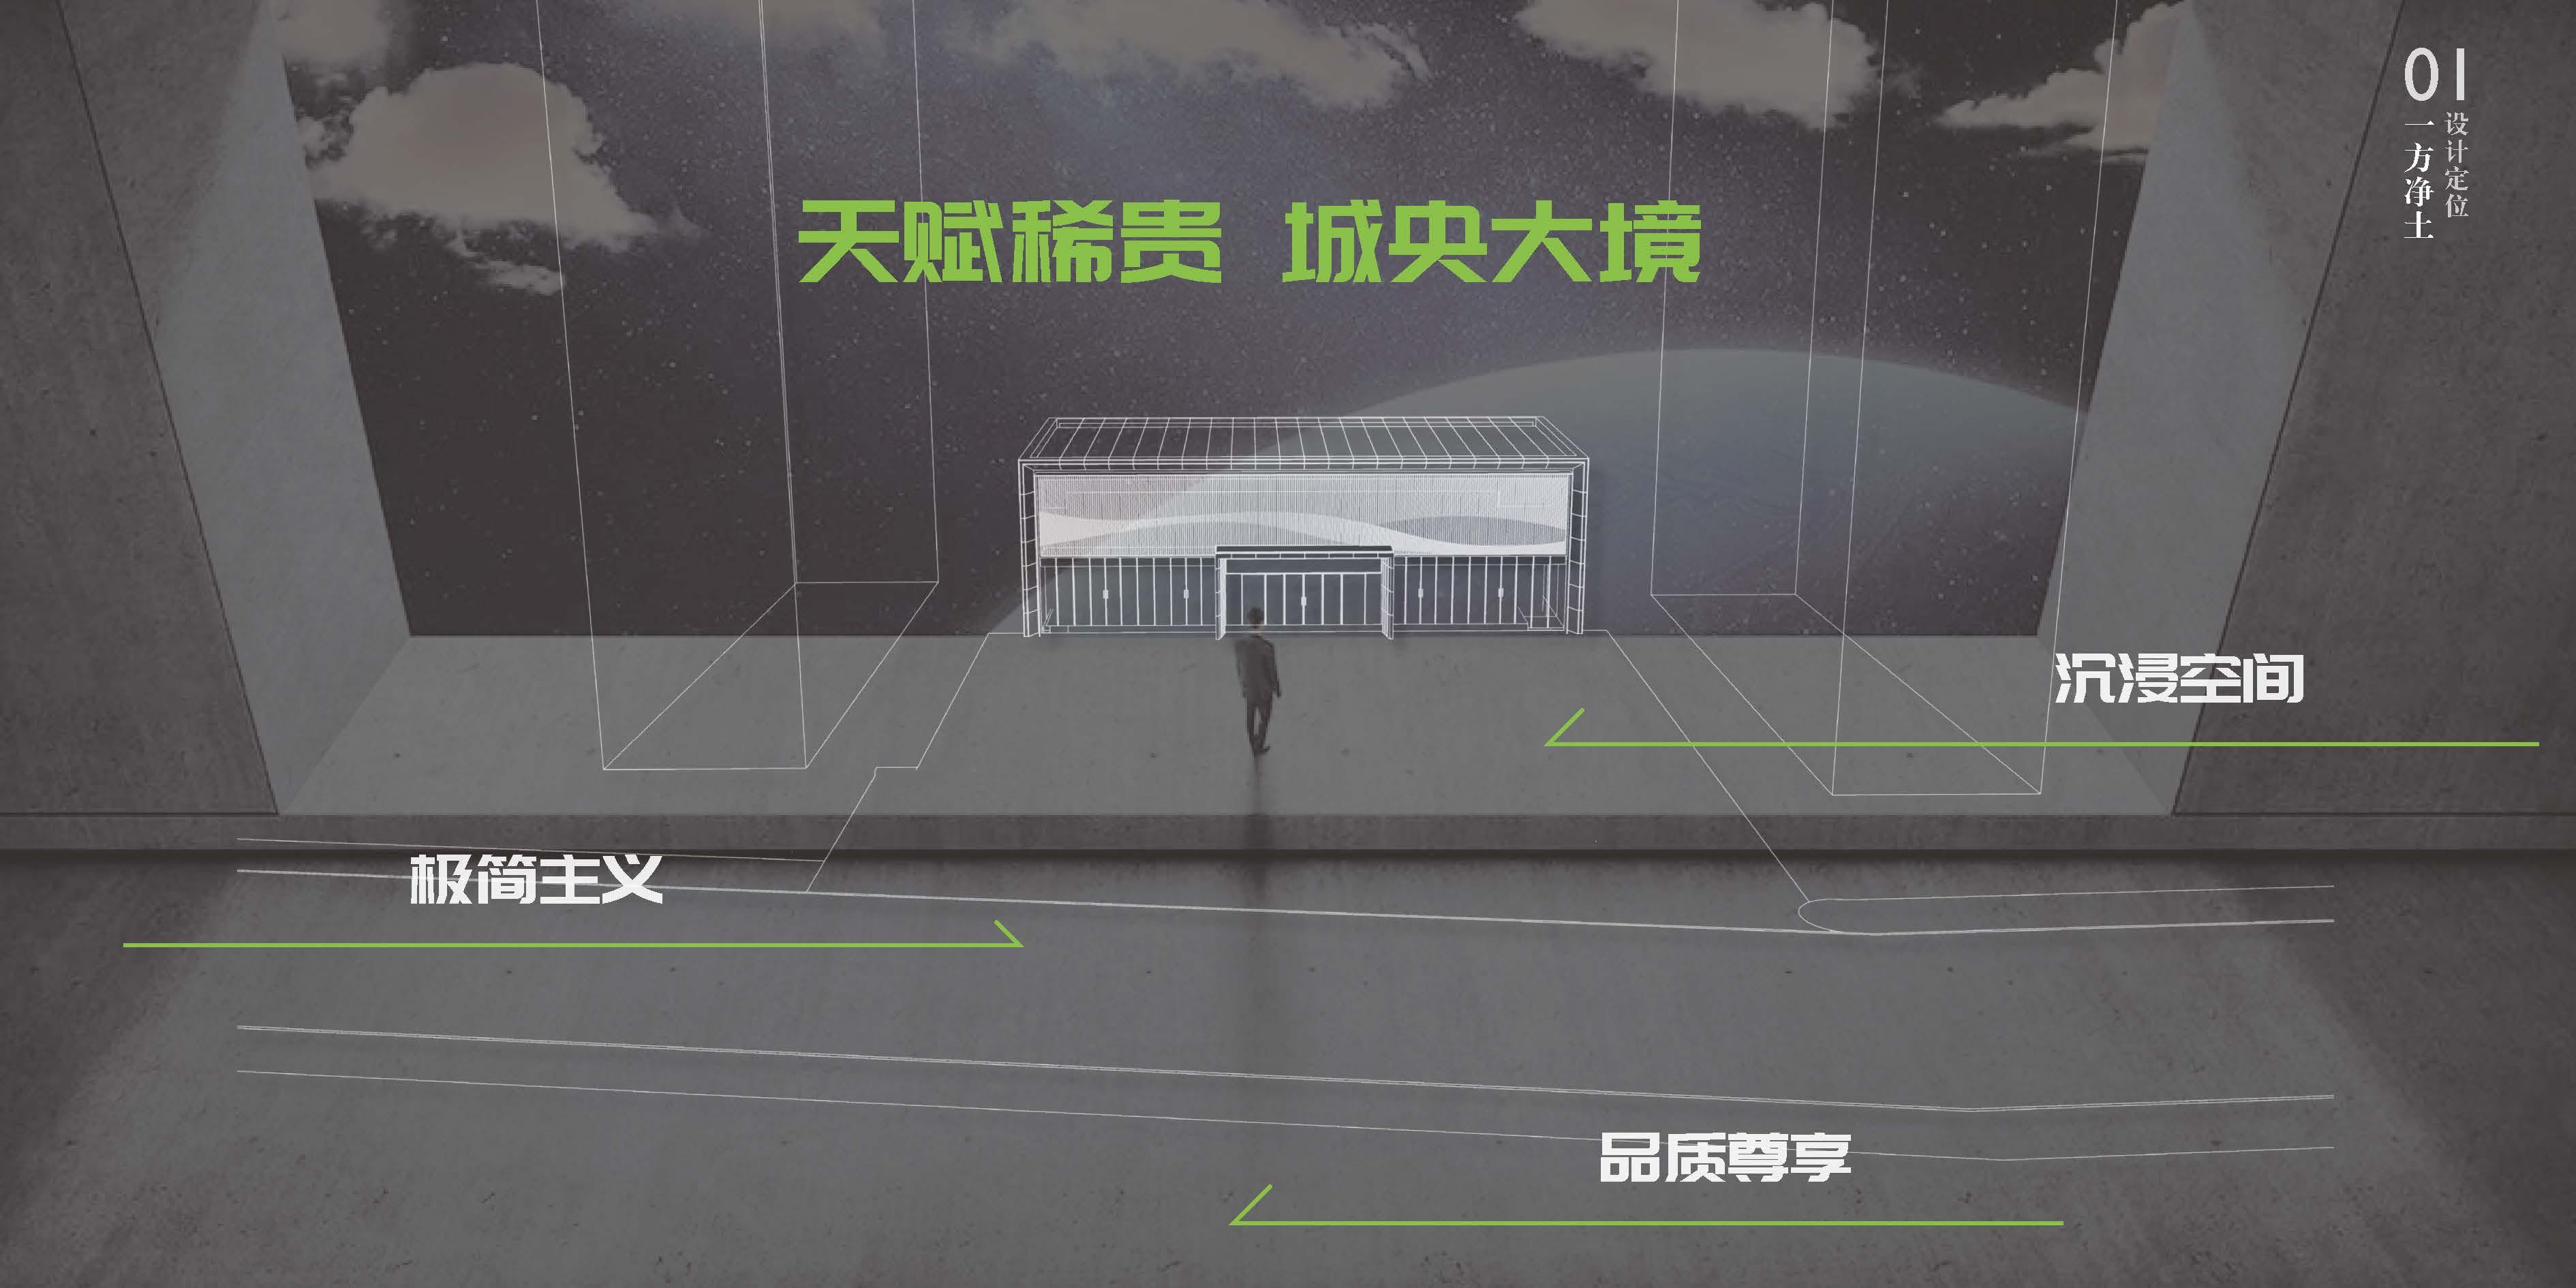 P21001-SA-MLP-南阳建业天玺住宅项目-20210409-集团汇报_页面_12.jpg